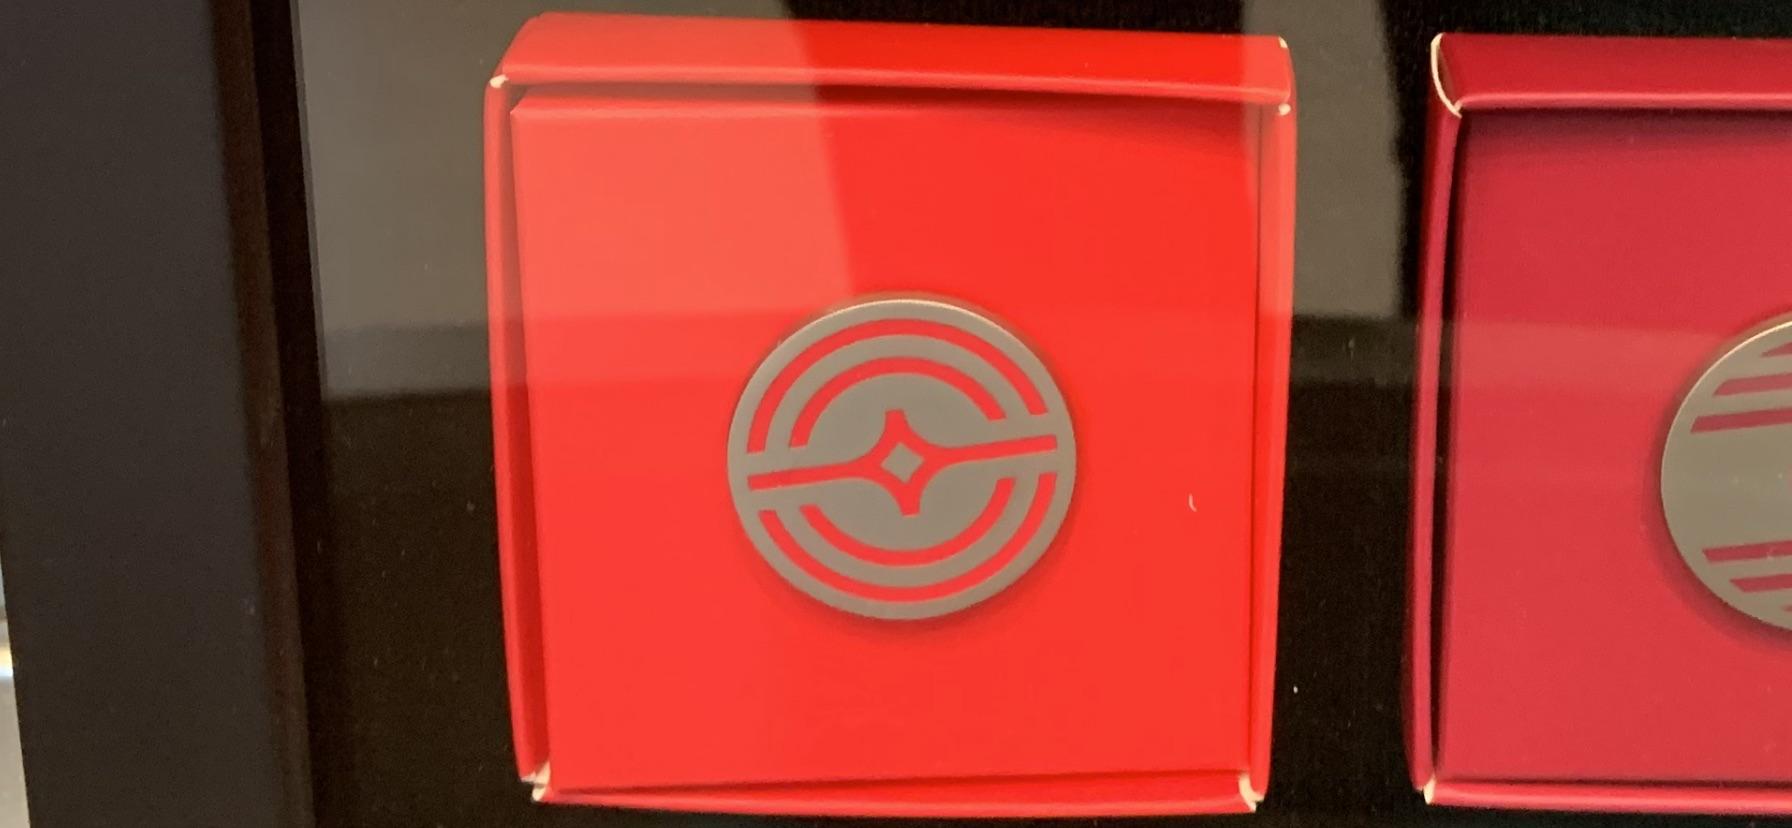 EPCOT pavilion logo pins 12/23/19 25